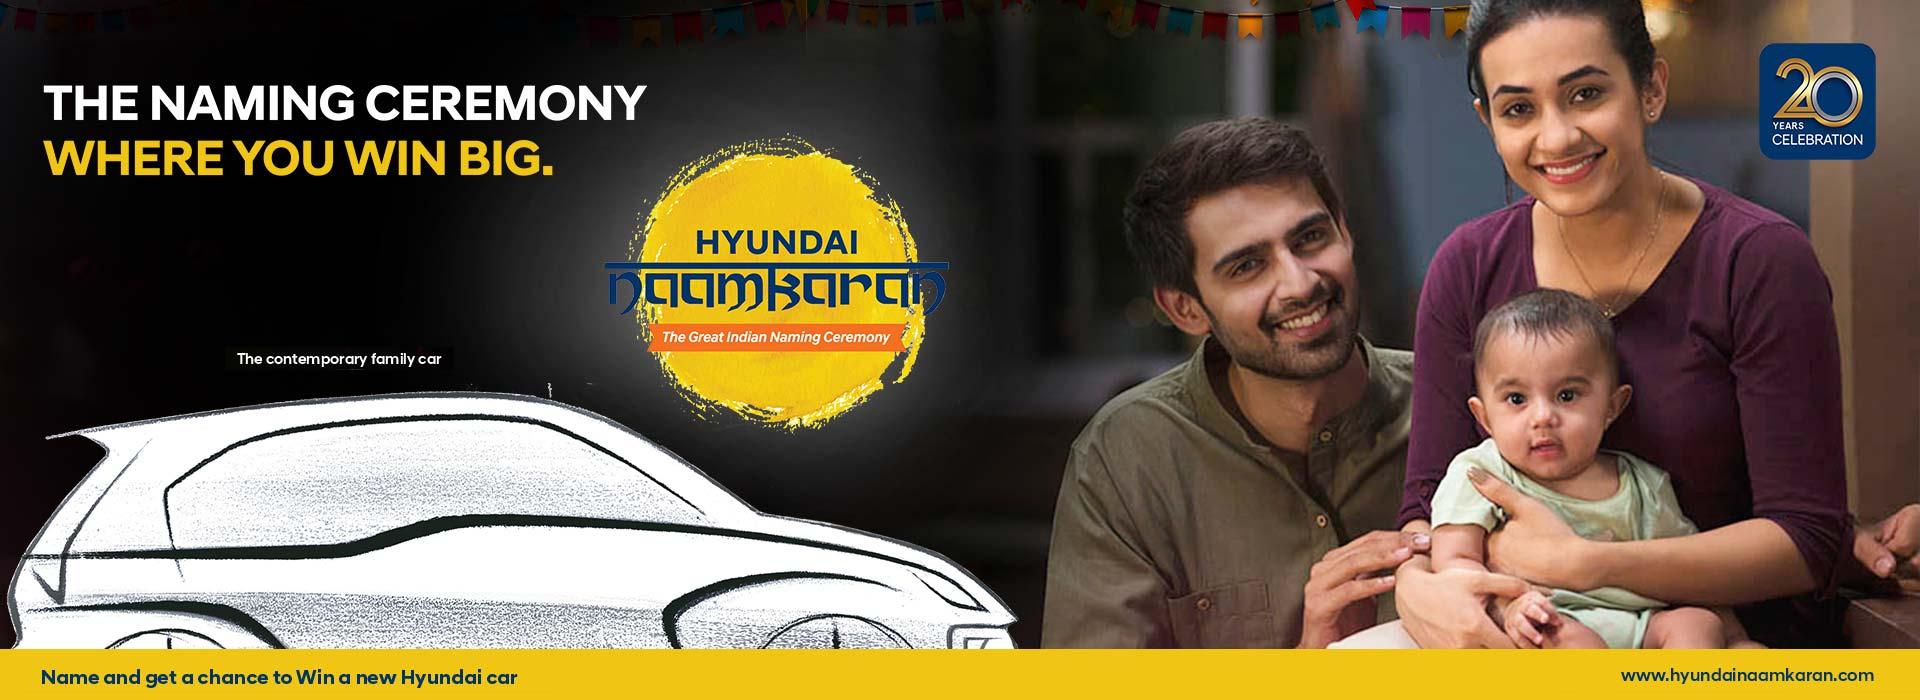 Sanjay Hyundai: Authorized new car dealership serving and